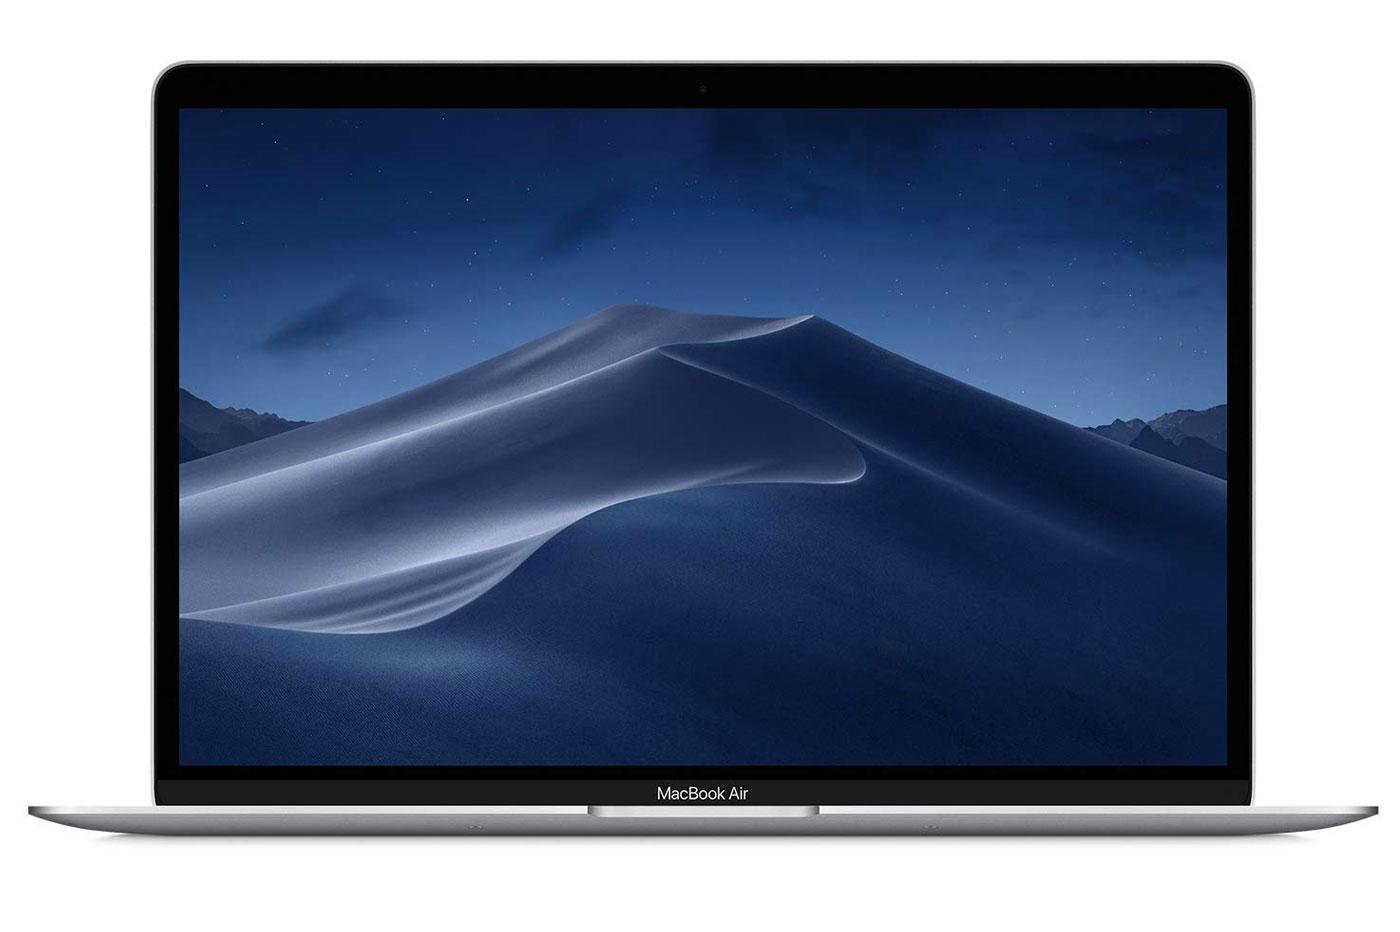 MacBook Air Black Friday